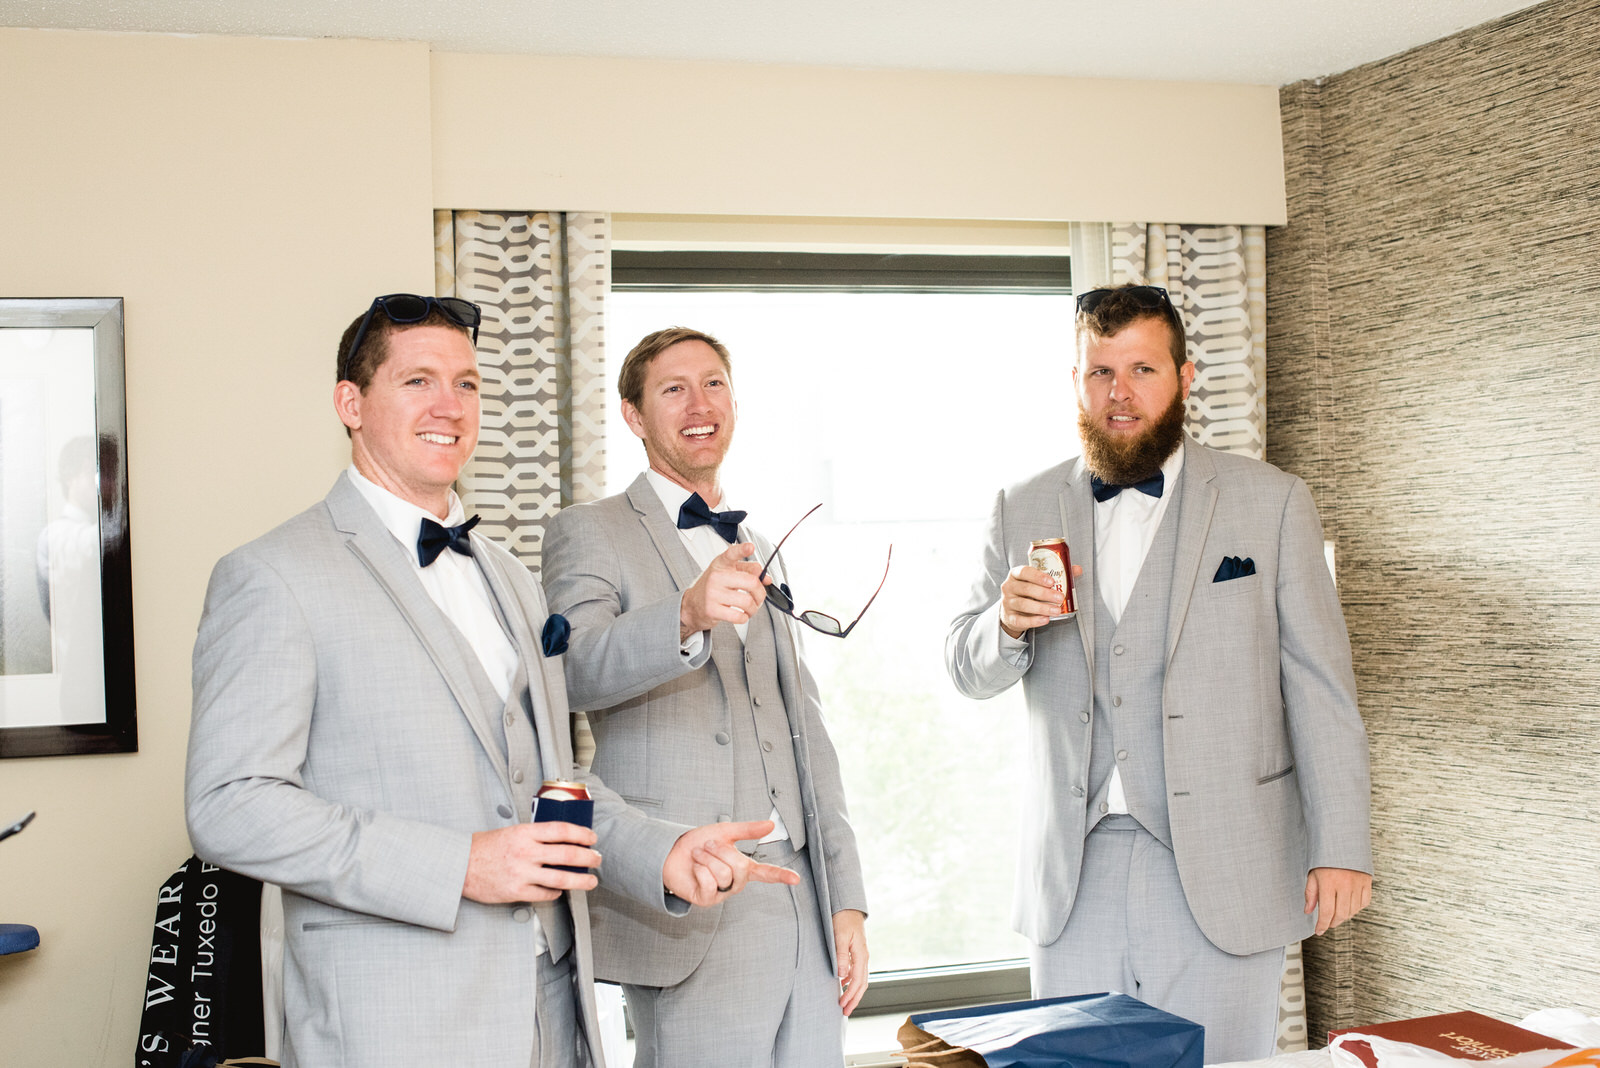 university club wedding pittsburgh